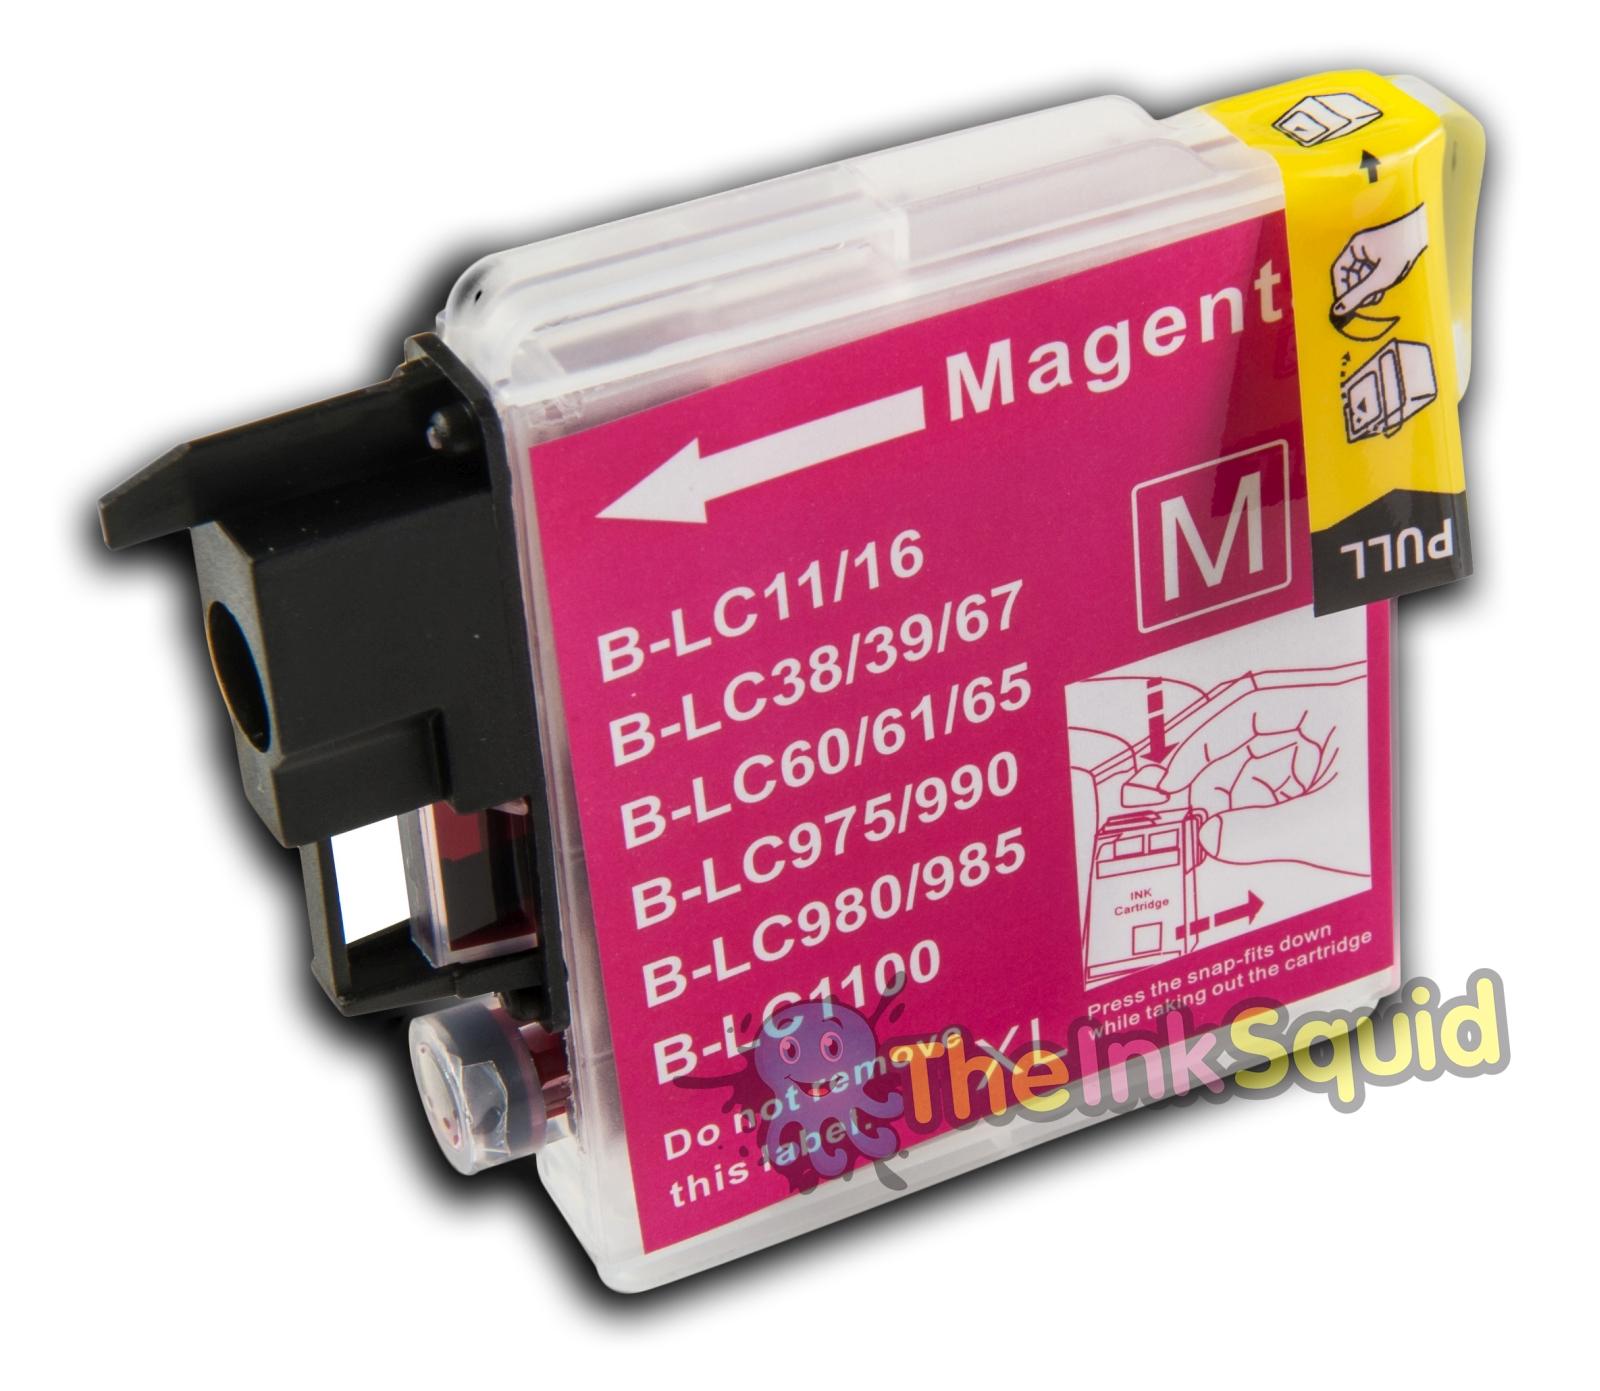 magenta red ink cartridge for brother dcp 145c dcp 145c ebay. Black Bedroom Furniture Sets. Home Design Ideas